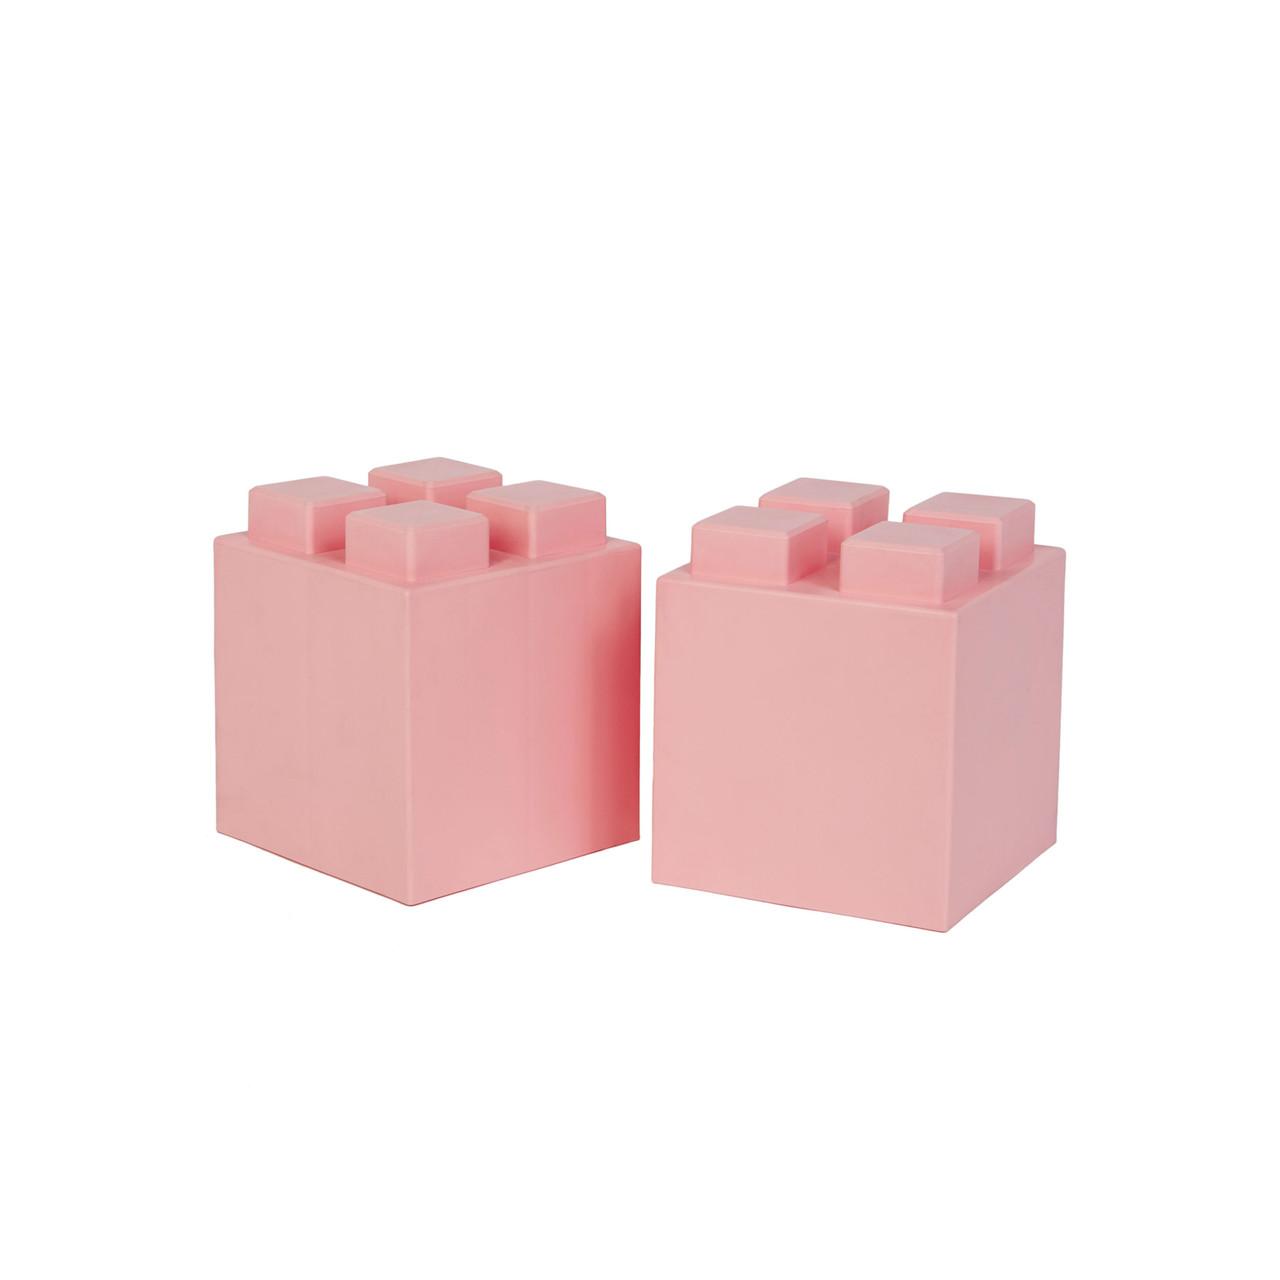 "6"" x 6"" Half Block Bulk Pack - 8 Blocks"